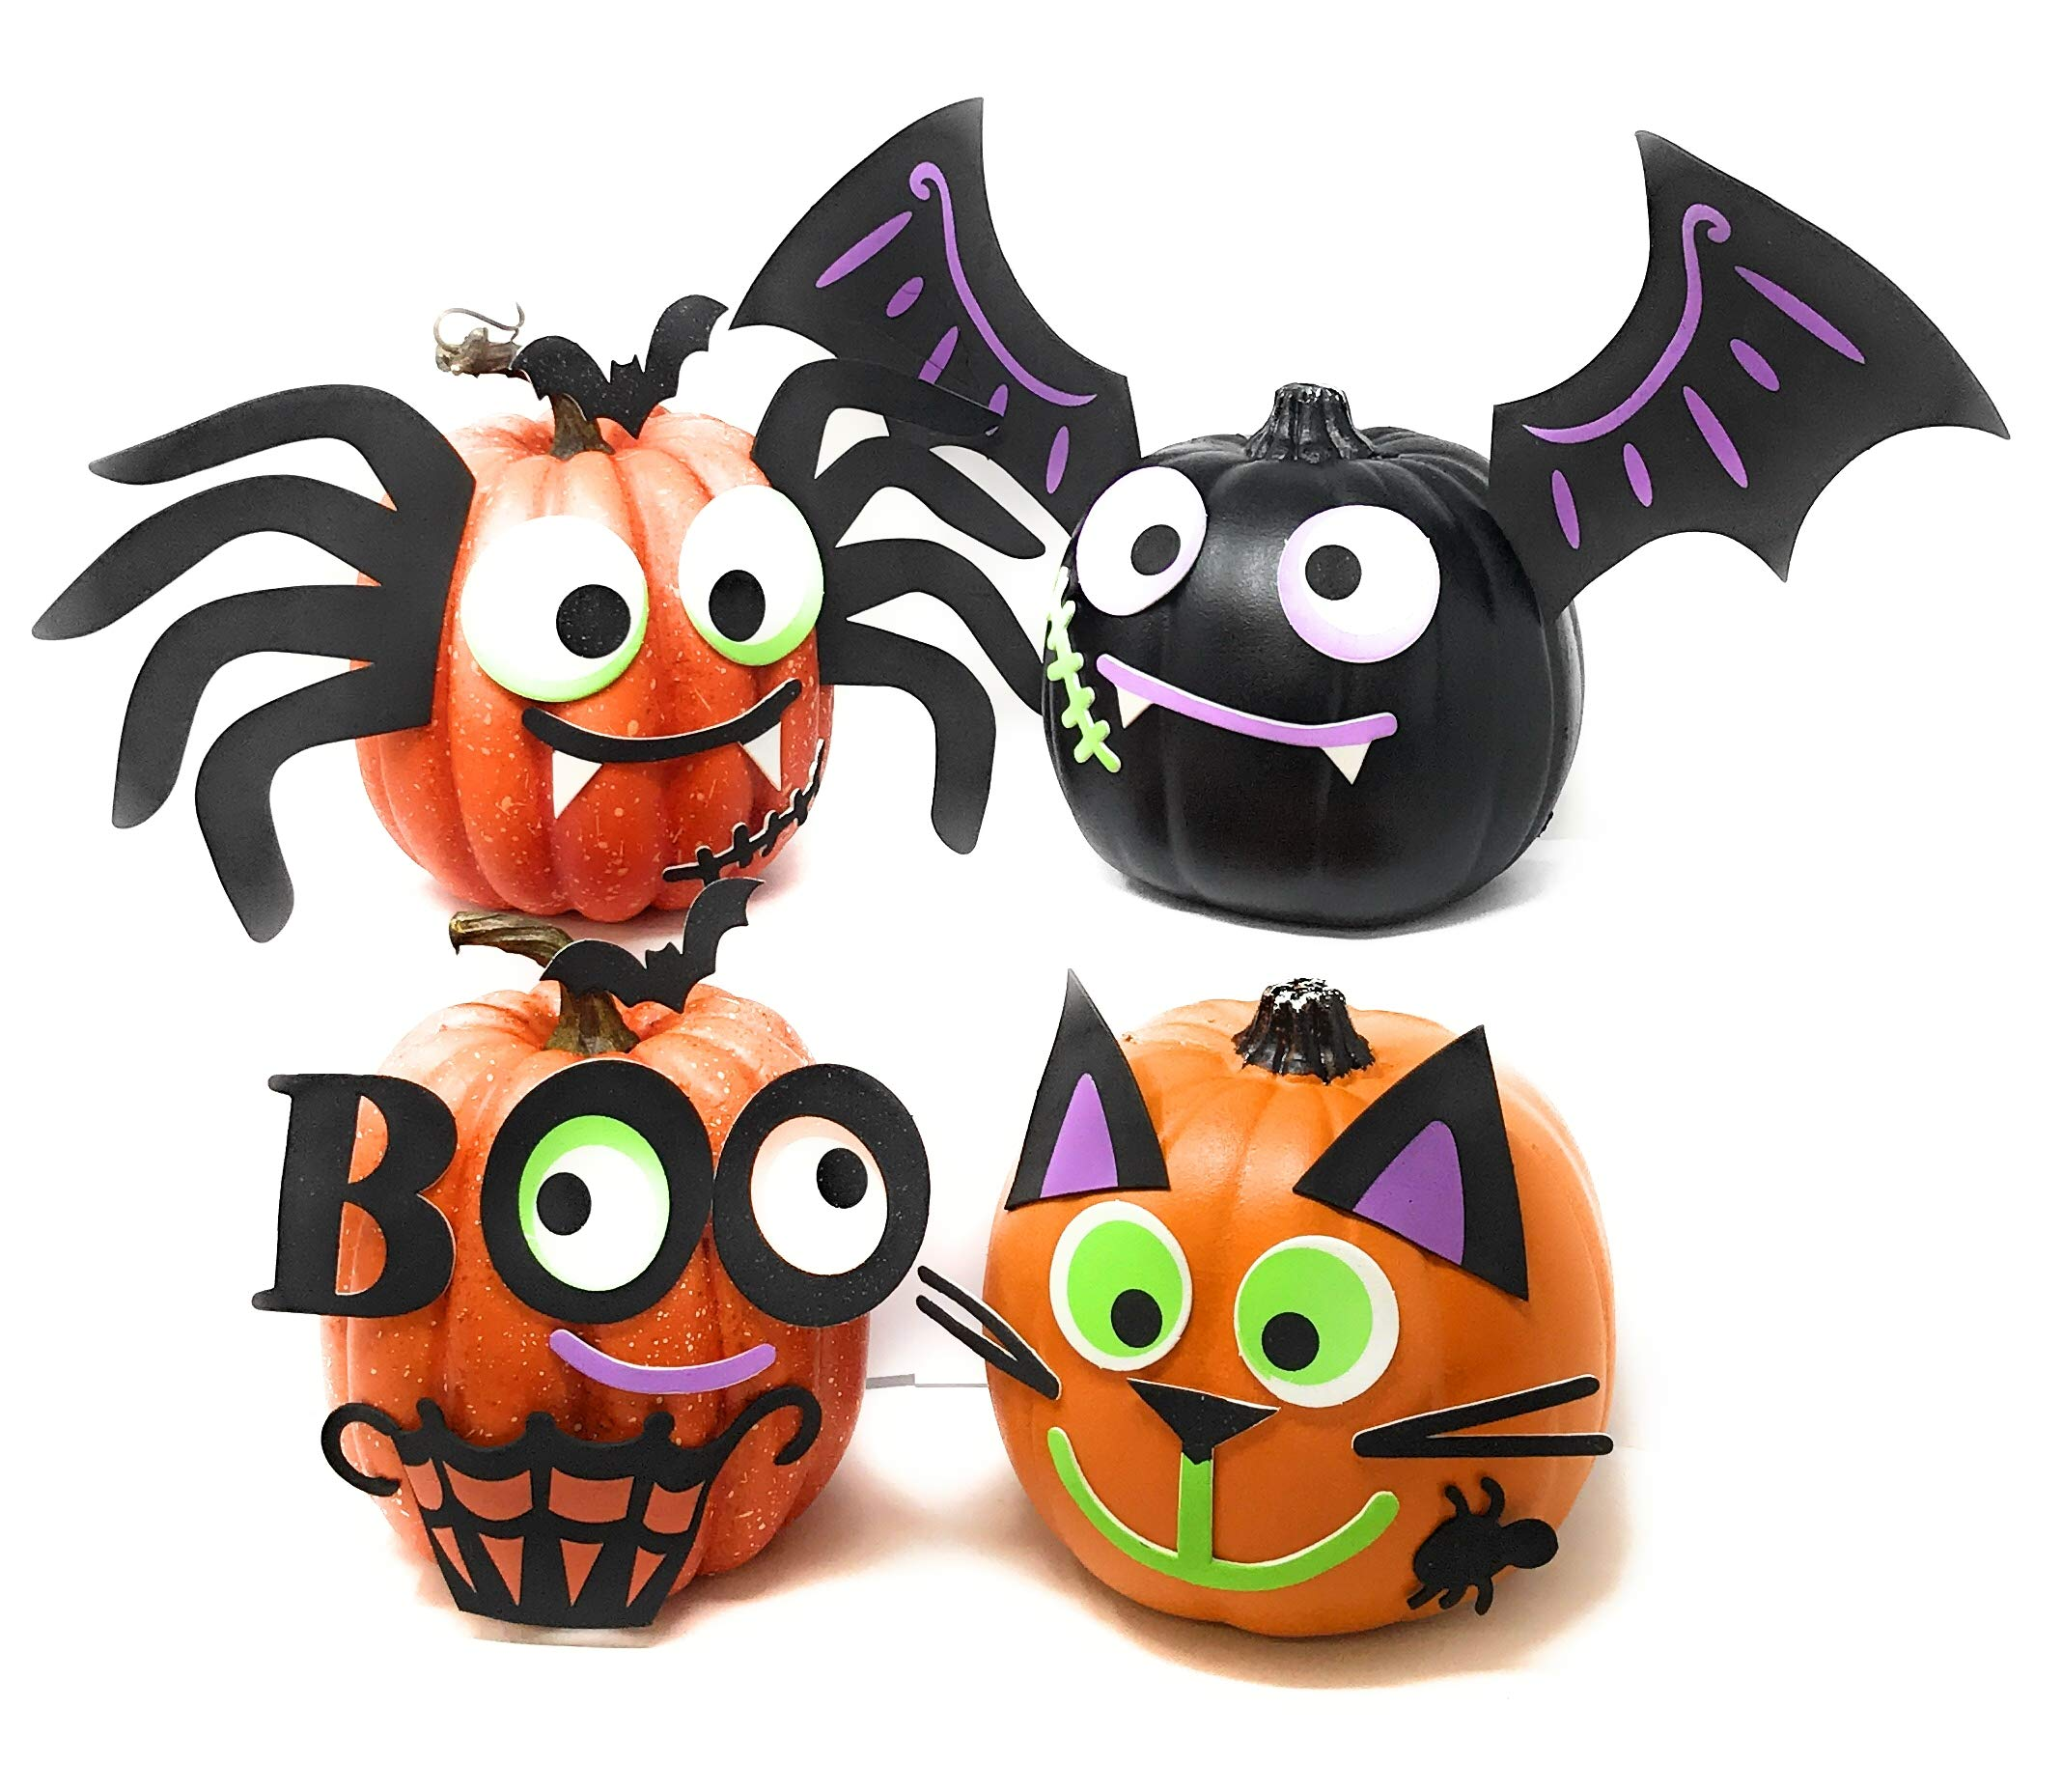 Funiverse Mega Bulk Pack 126 Piece Foam Halloween Pumpkin Decorating Craft Kit Stickers - Makes 16 Pumpkins (Pumpkins Not Included) by Funiverse